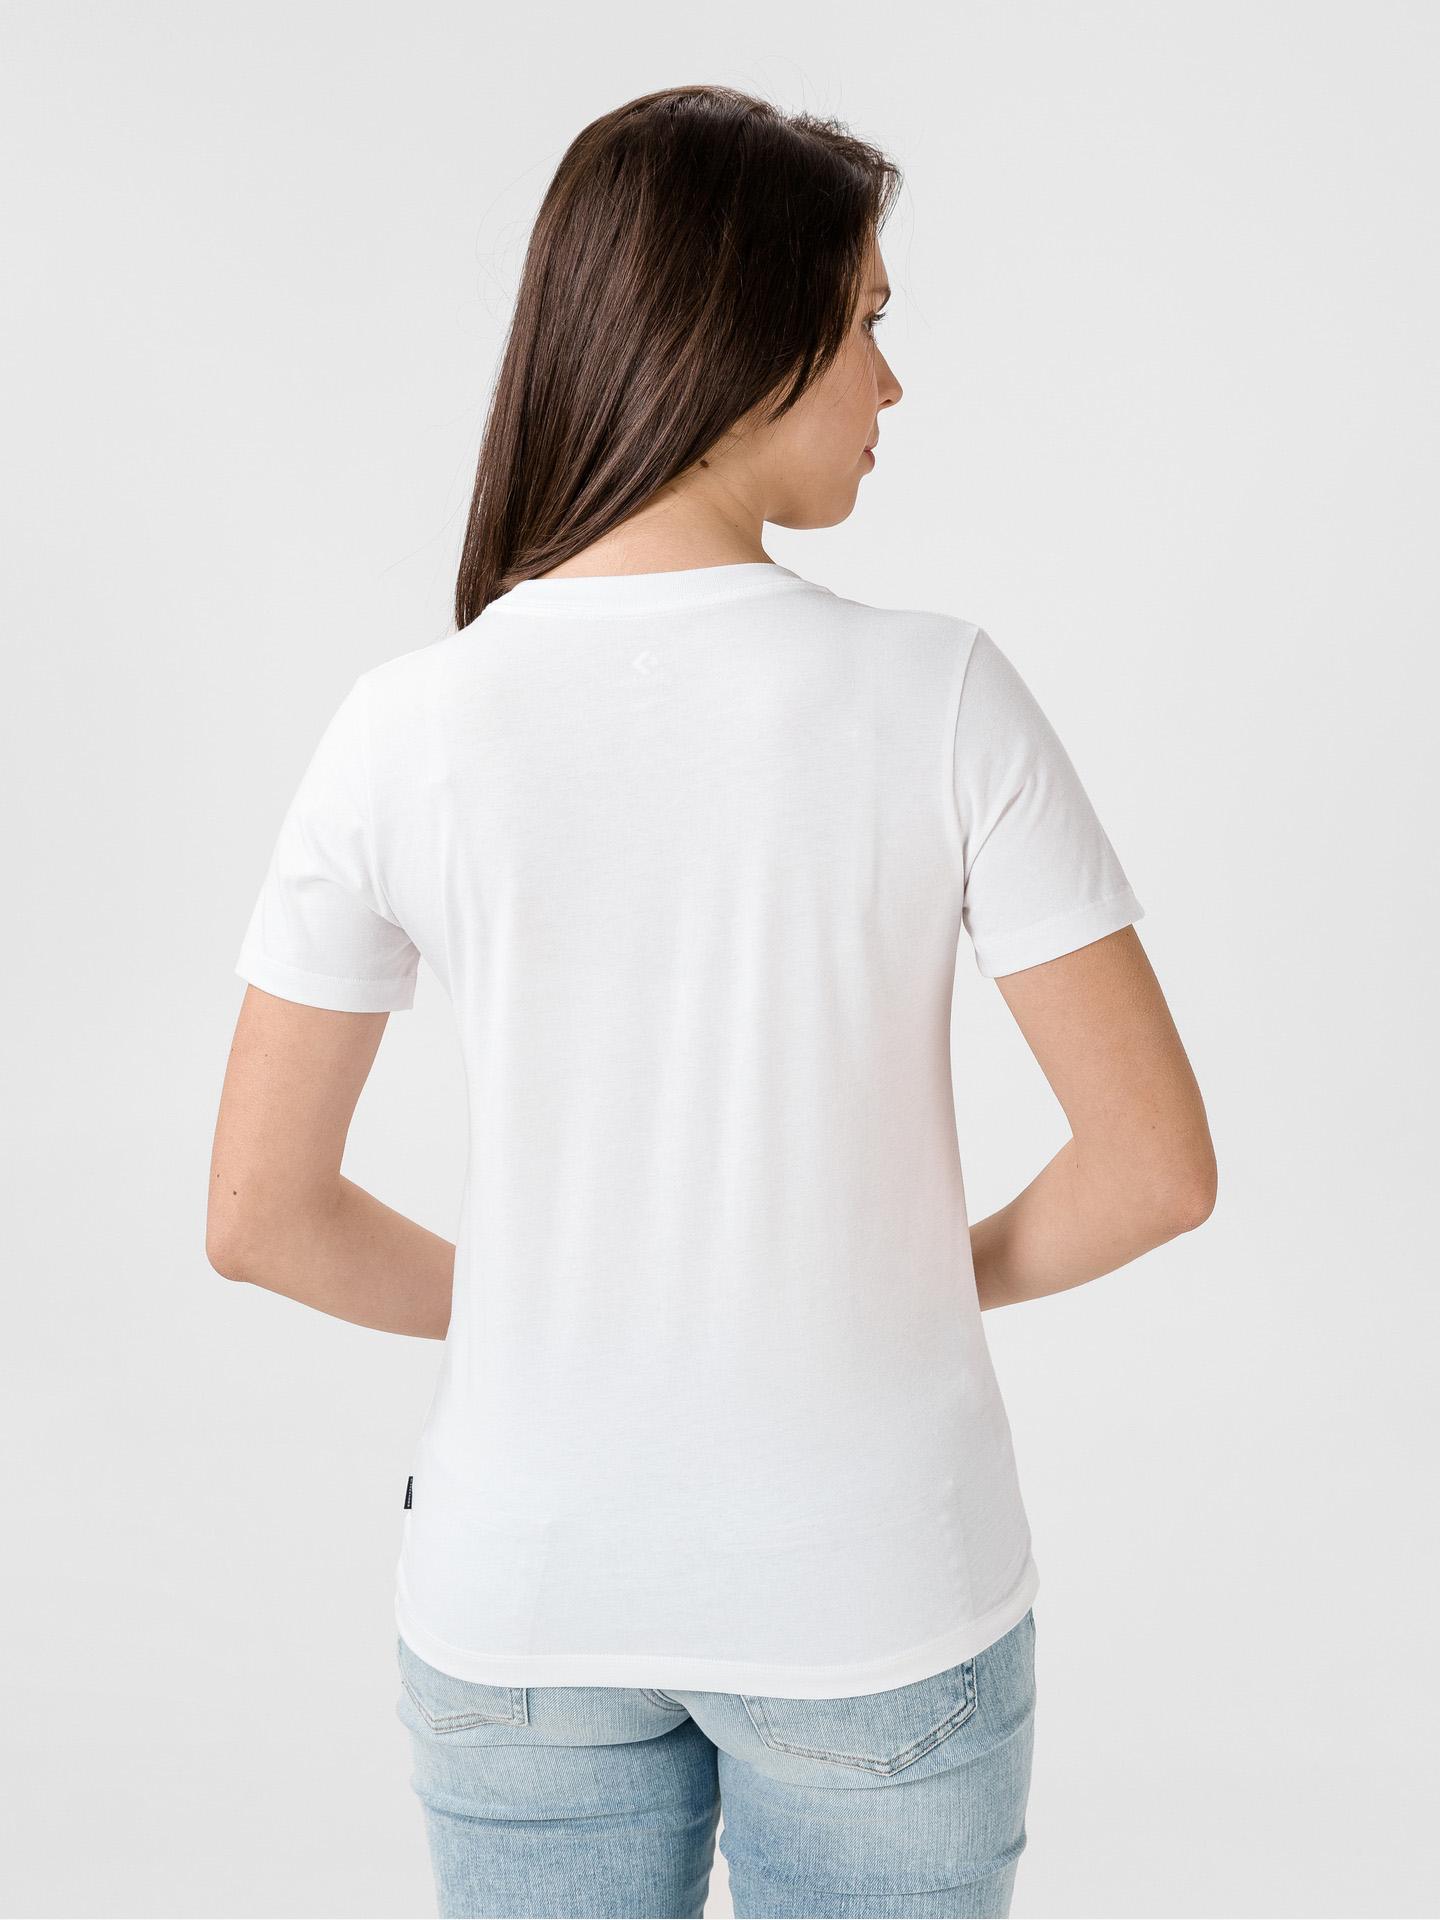 White women's Converse T-shirt